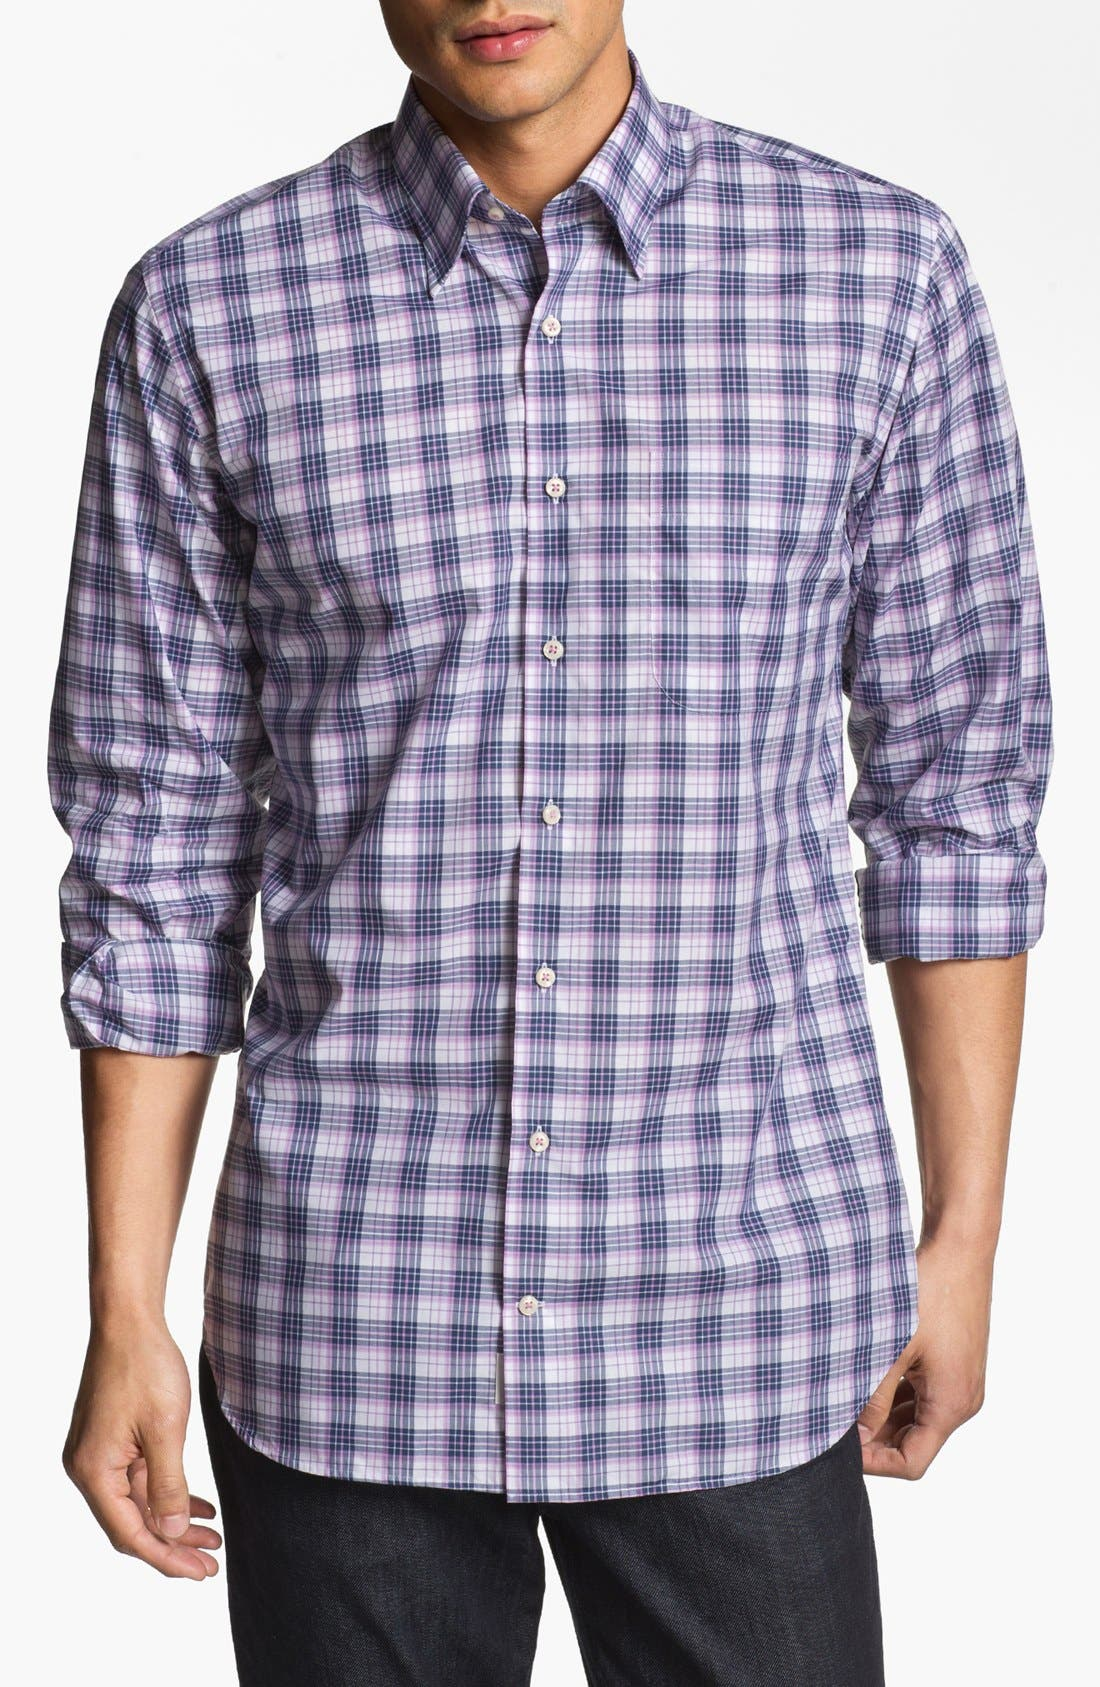 Alternate Image 1 Selected - Peter Millar 'Portofino' Regular Fit Sport Shirt (Tall)